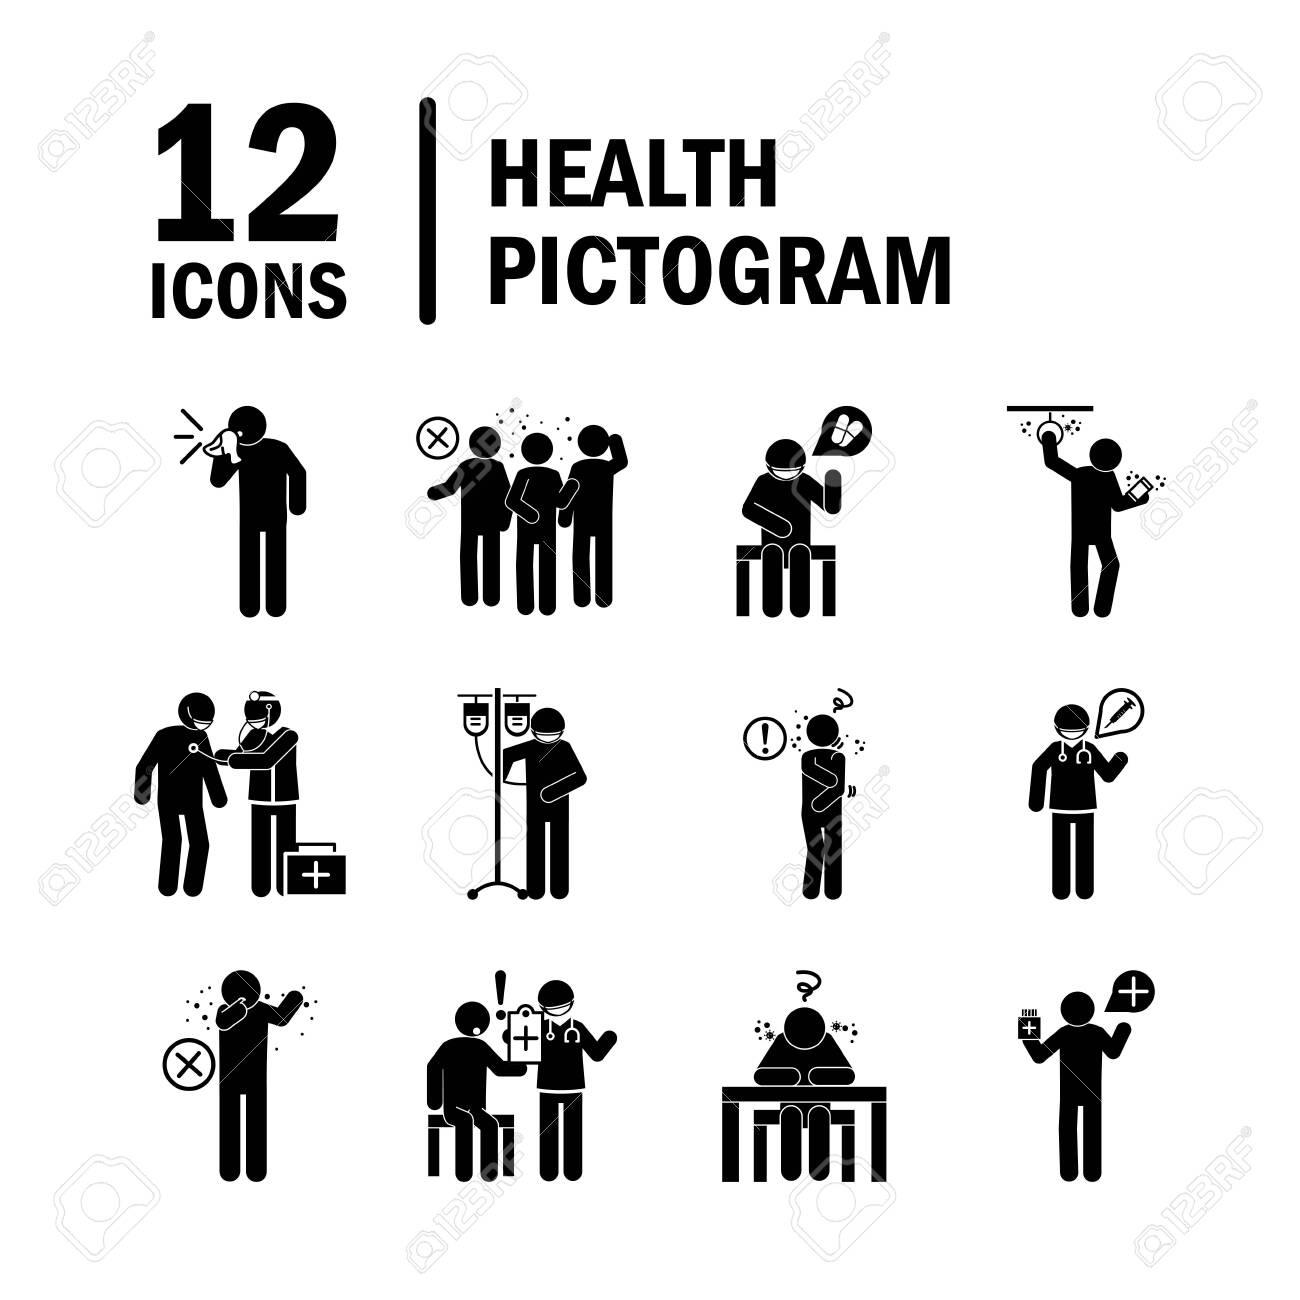 coronavirus covid 19, health pictogram, prevention, symptoms, medical icons set , silhouette style icon - 145247889